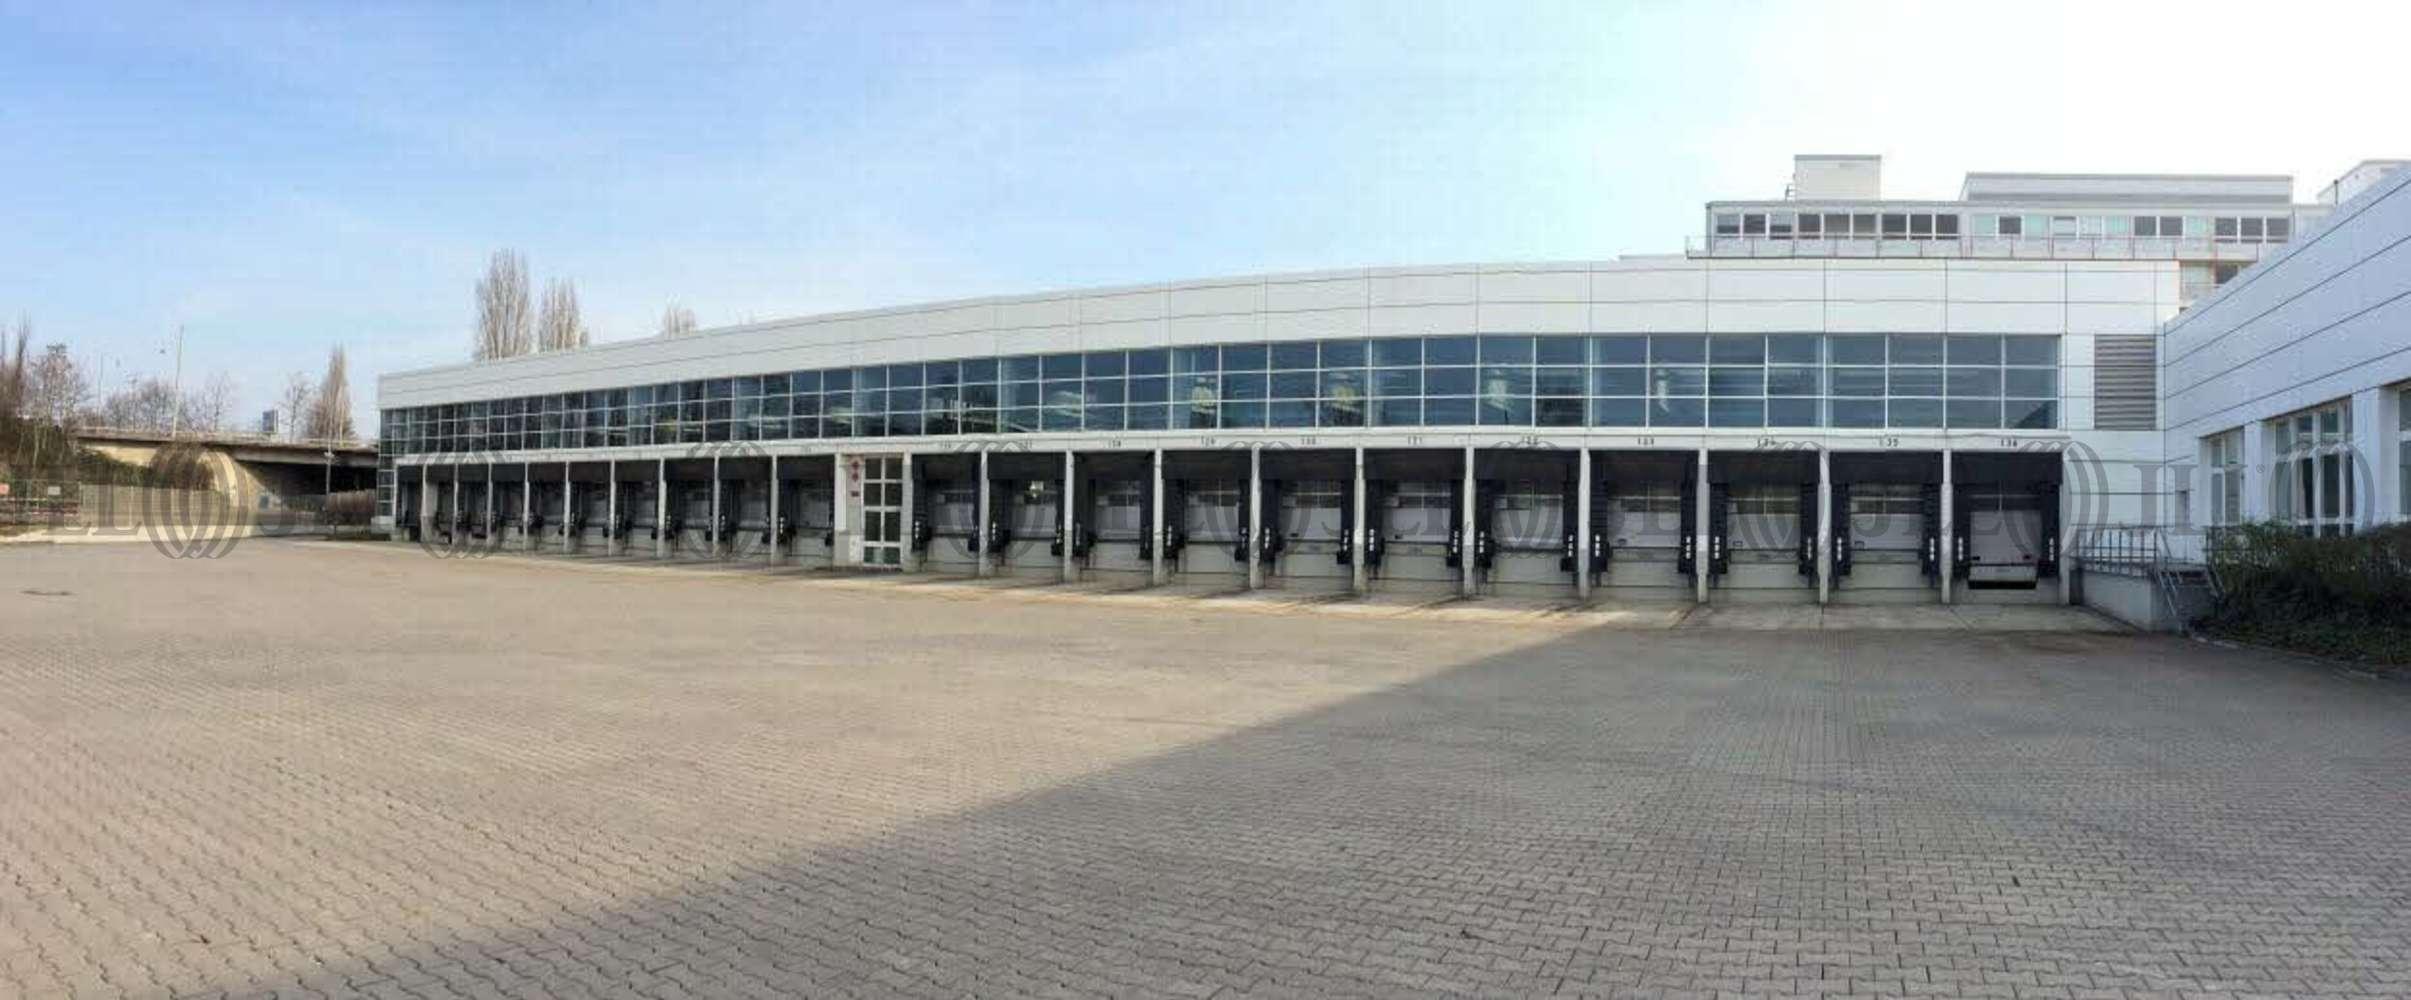 Hallen Frankfurt am main, 60386